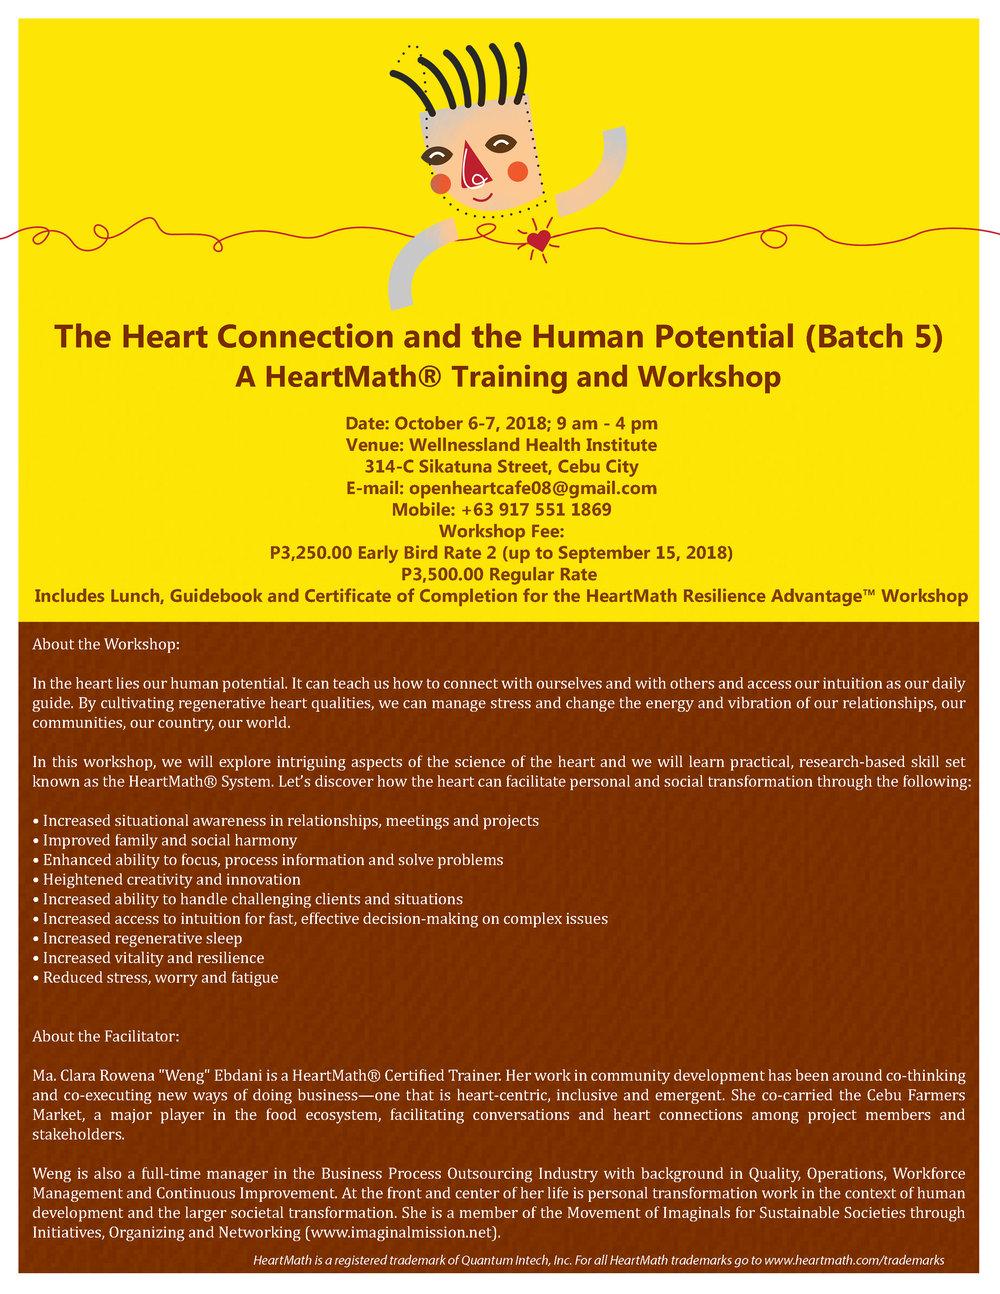 The Heart Connection_Cebu Batch 5_October 2018.jpg